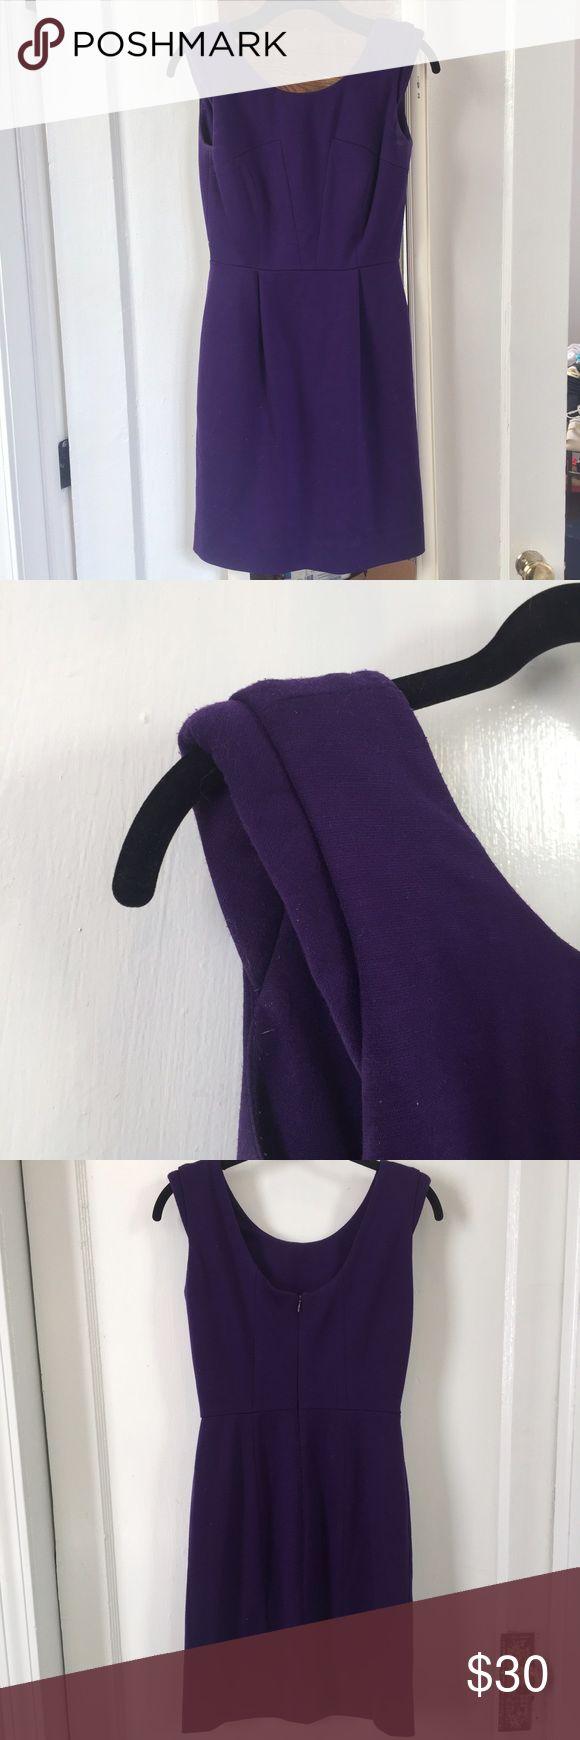 Gianni Bini Purple Dress Gianni Bini purple dress with a little padding on the shoulders Gianni Bini Dresses Mini